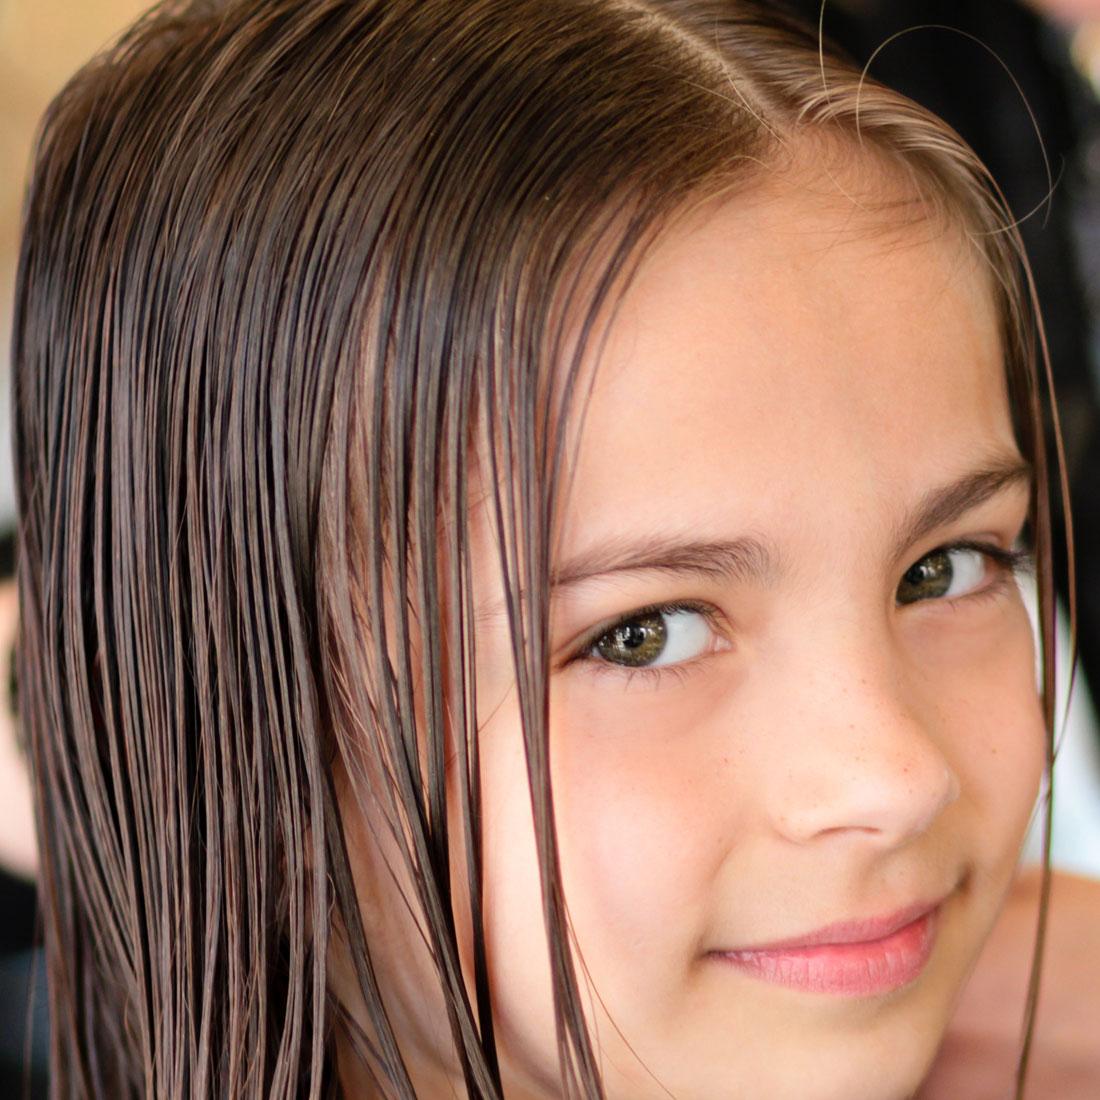 Little girl getting a haircut